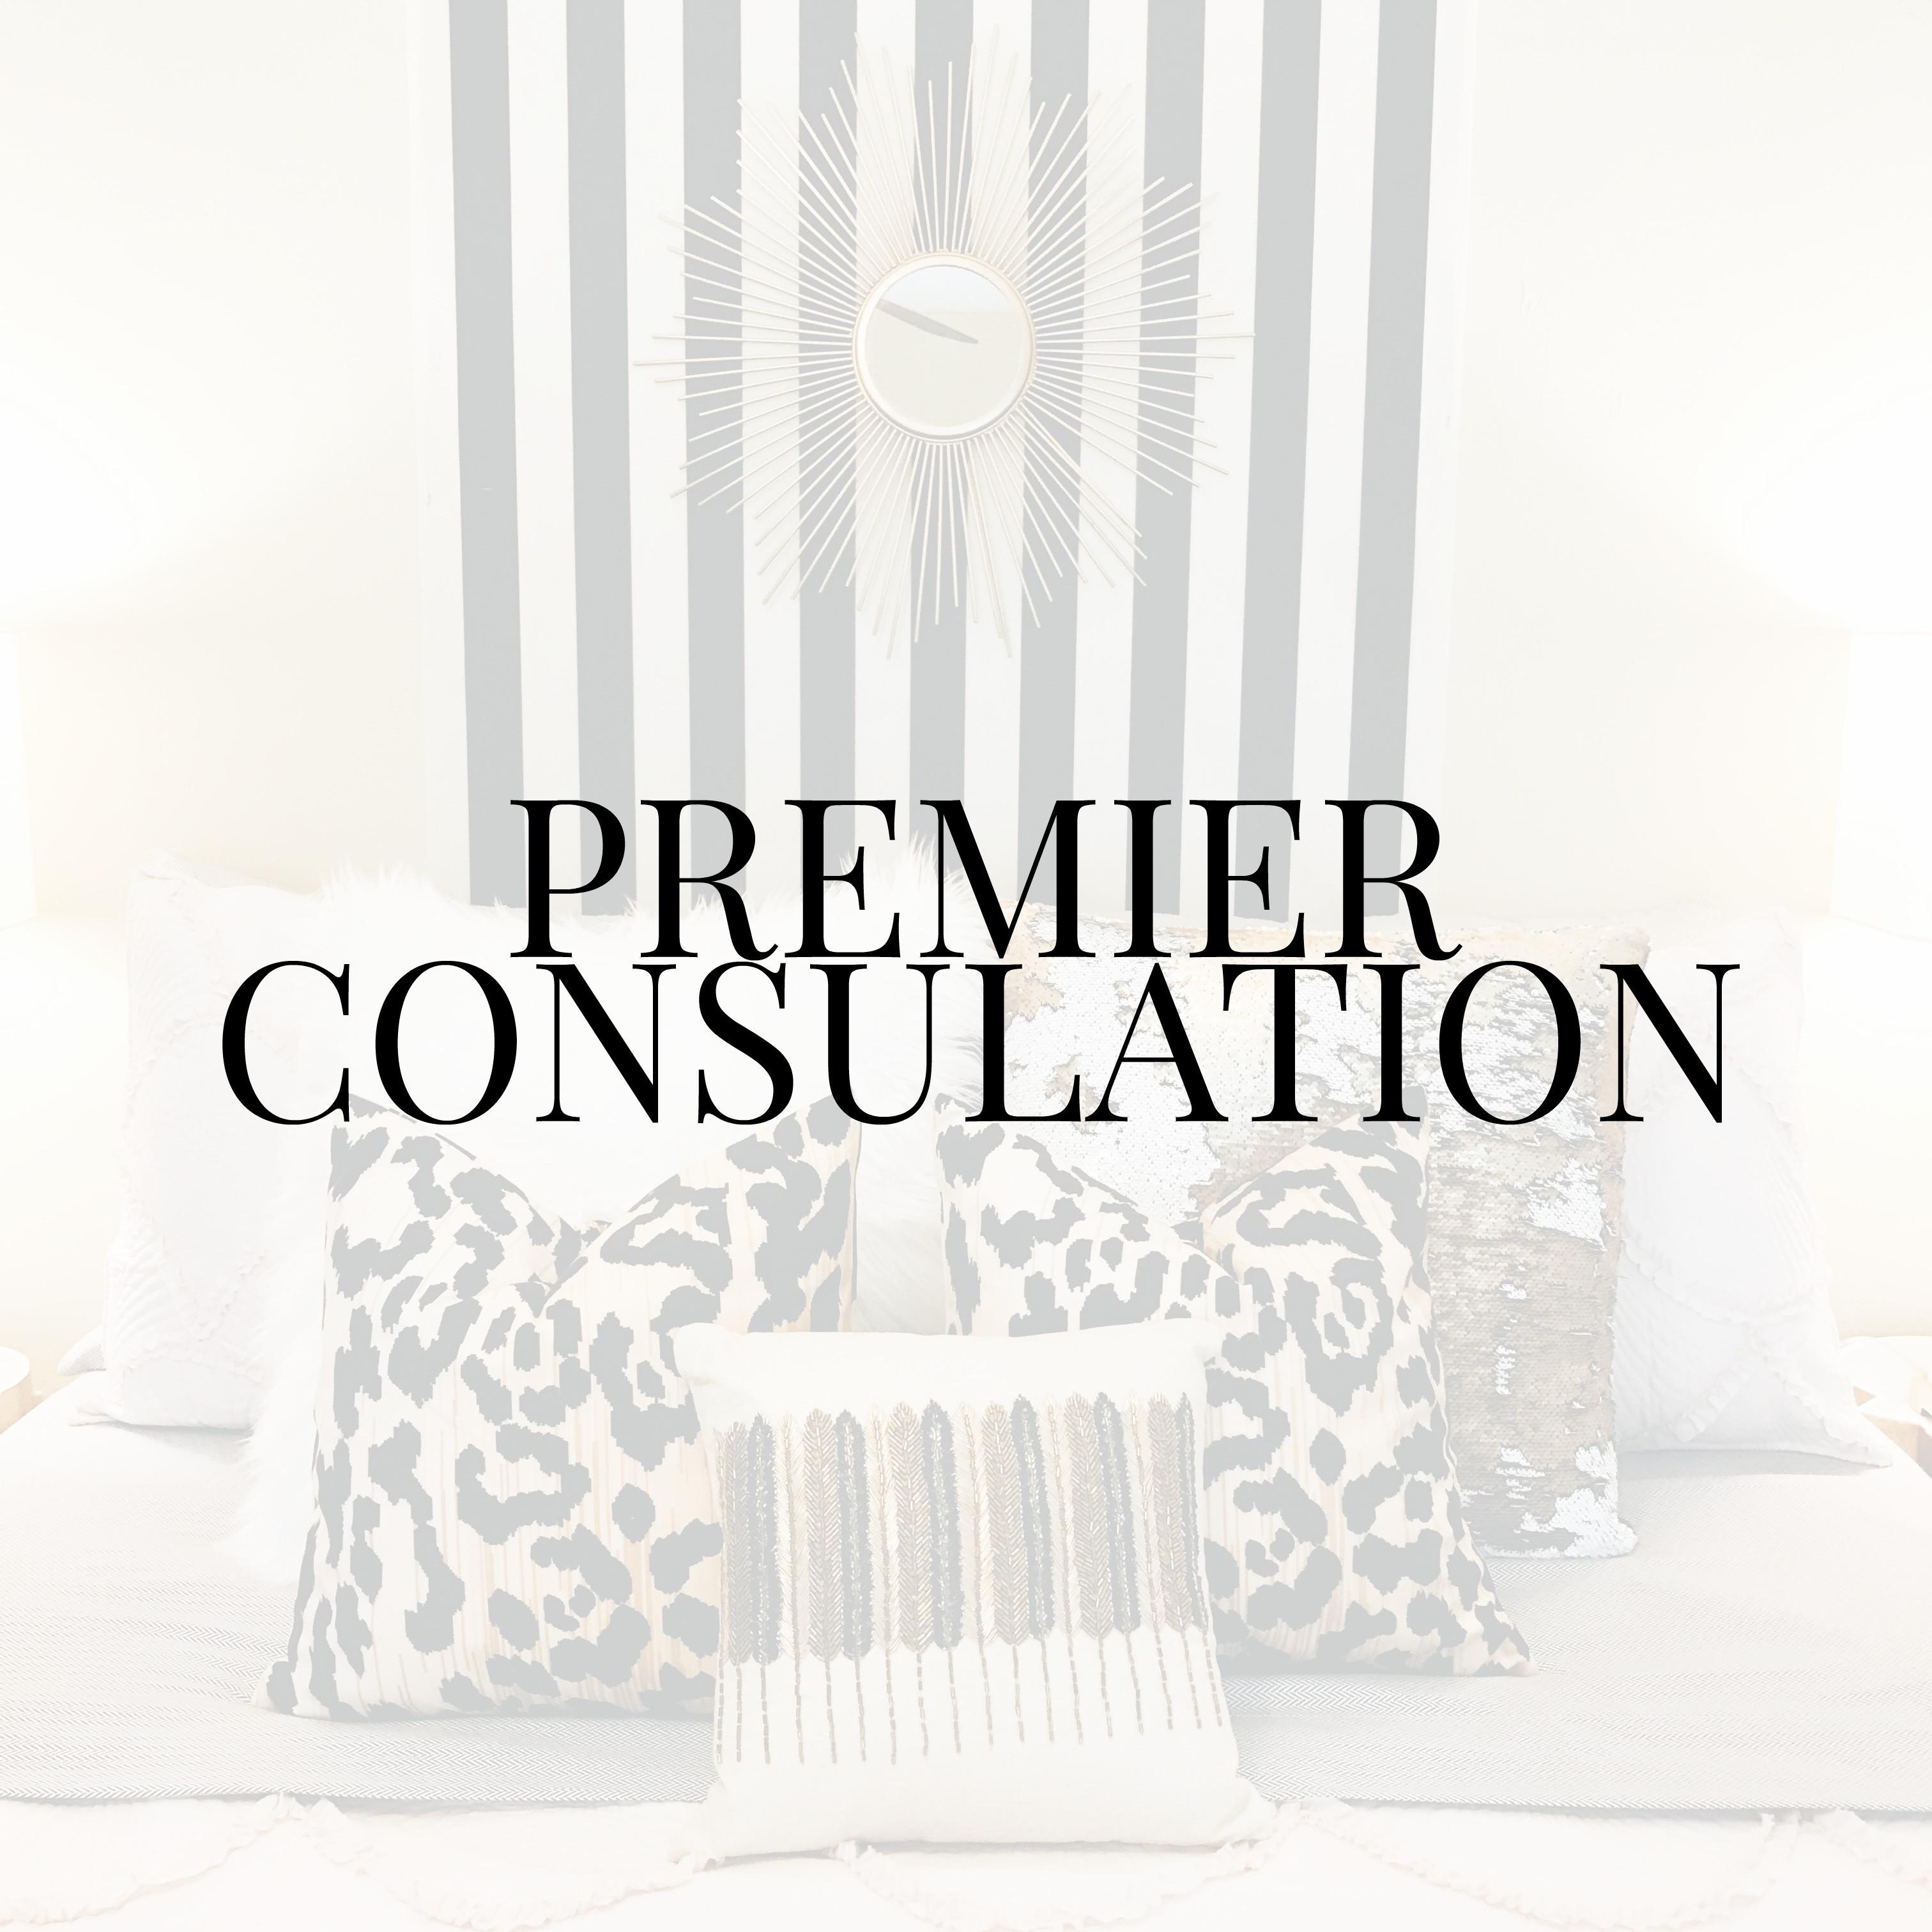 Premier Consultation